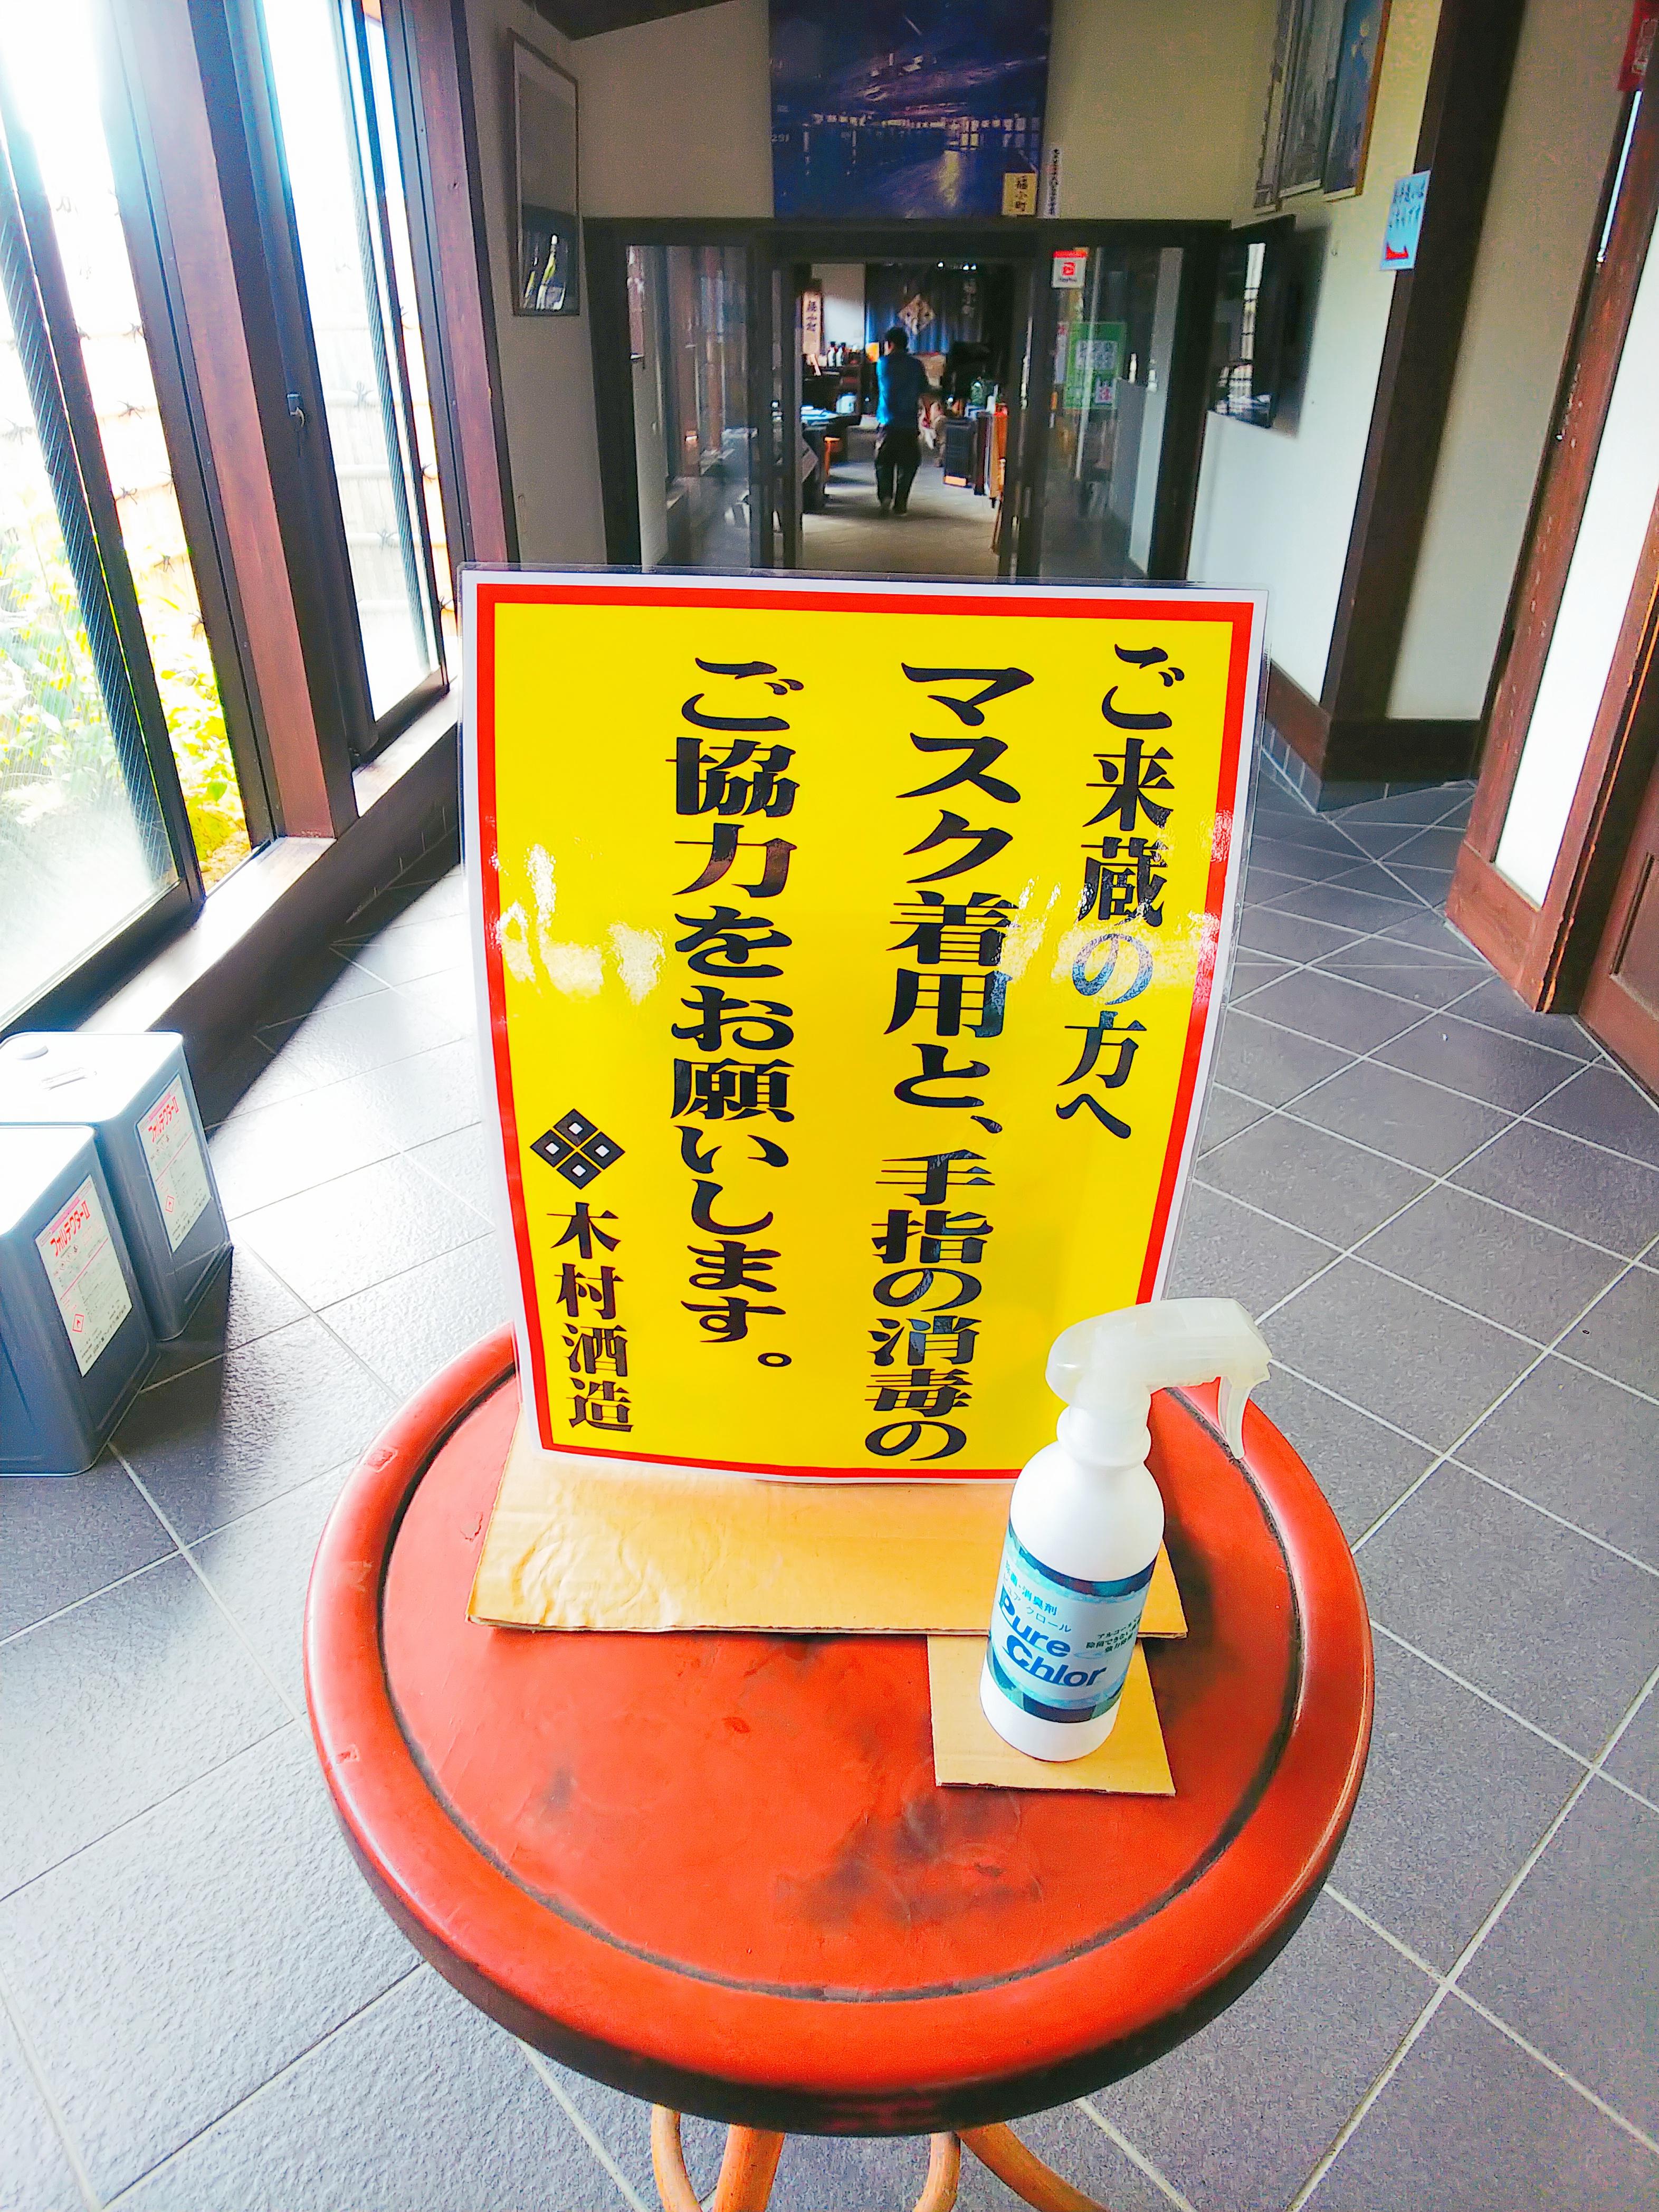 http://www.fukukomachi.com/blog/photo/C360_2020-08-06-15-12-32-678%20%281%29.jpg